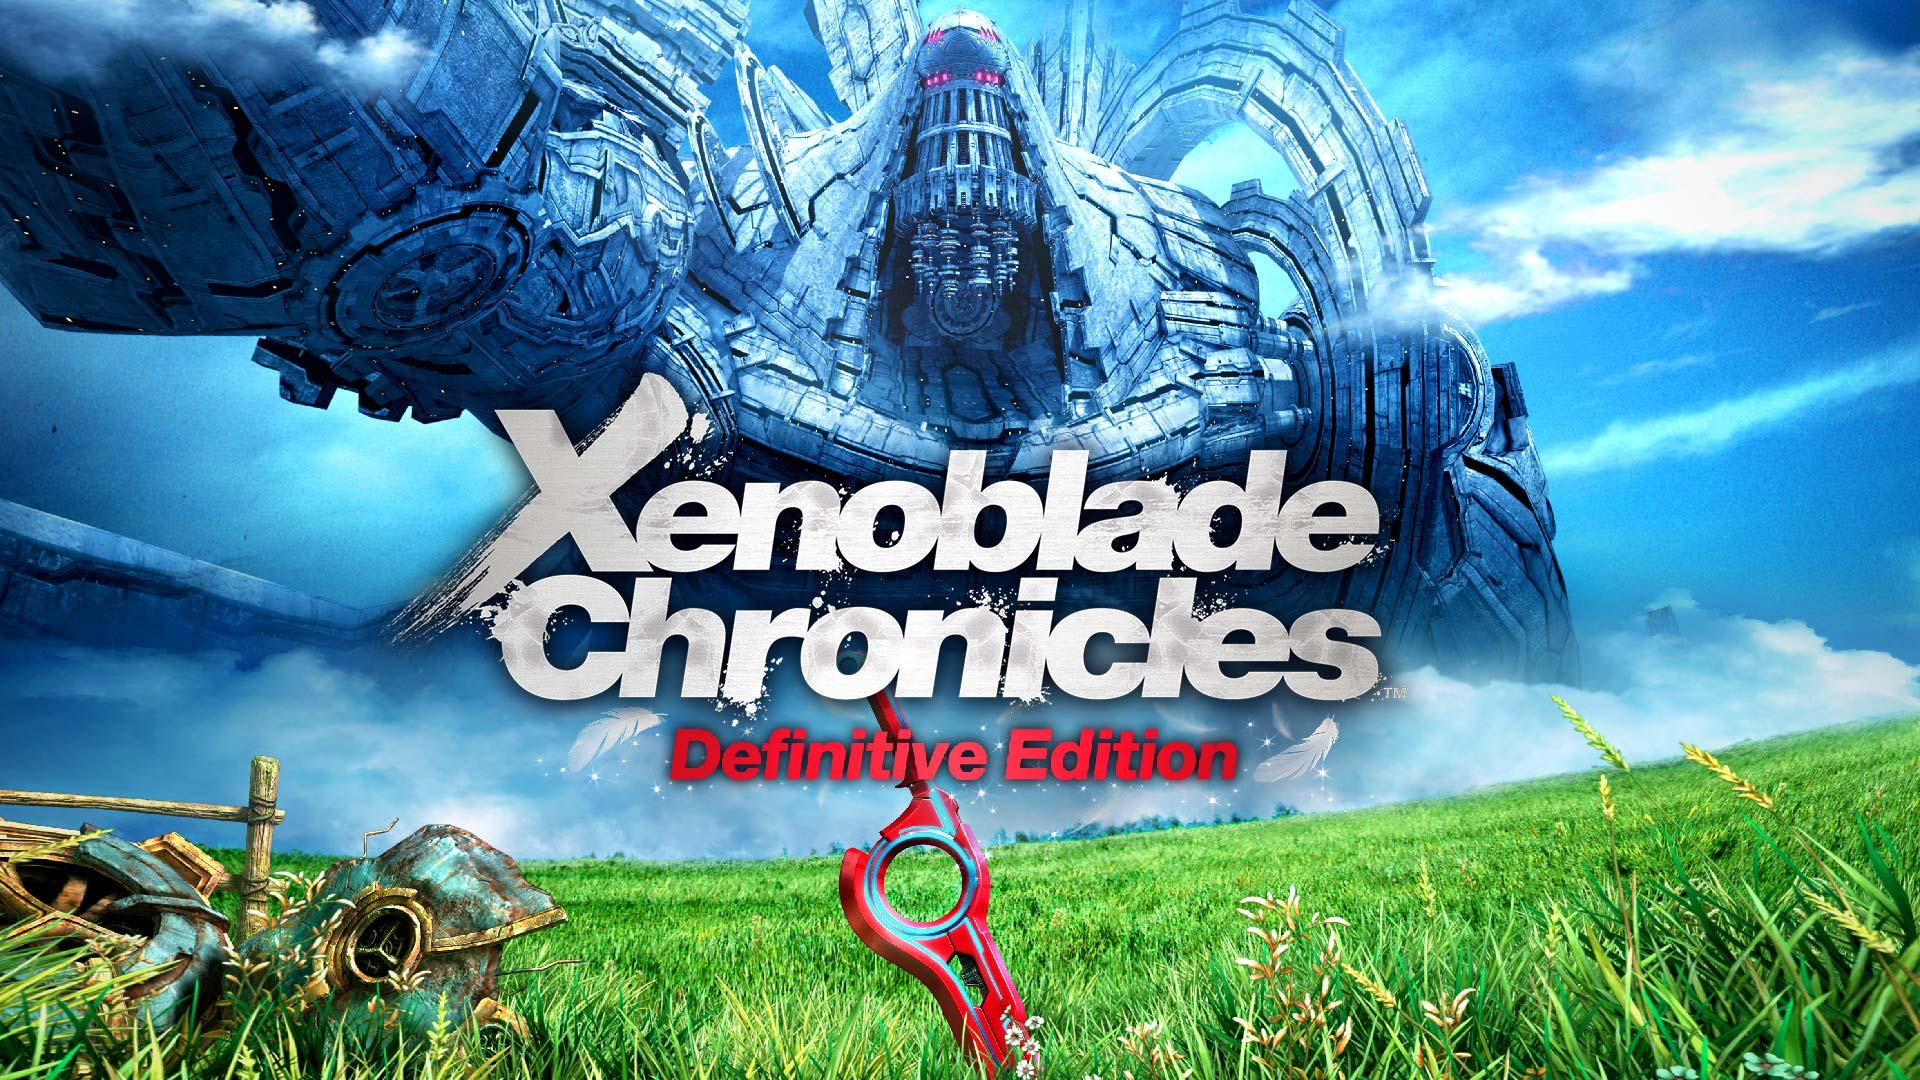 xenoblade chronicles, heal